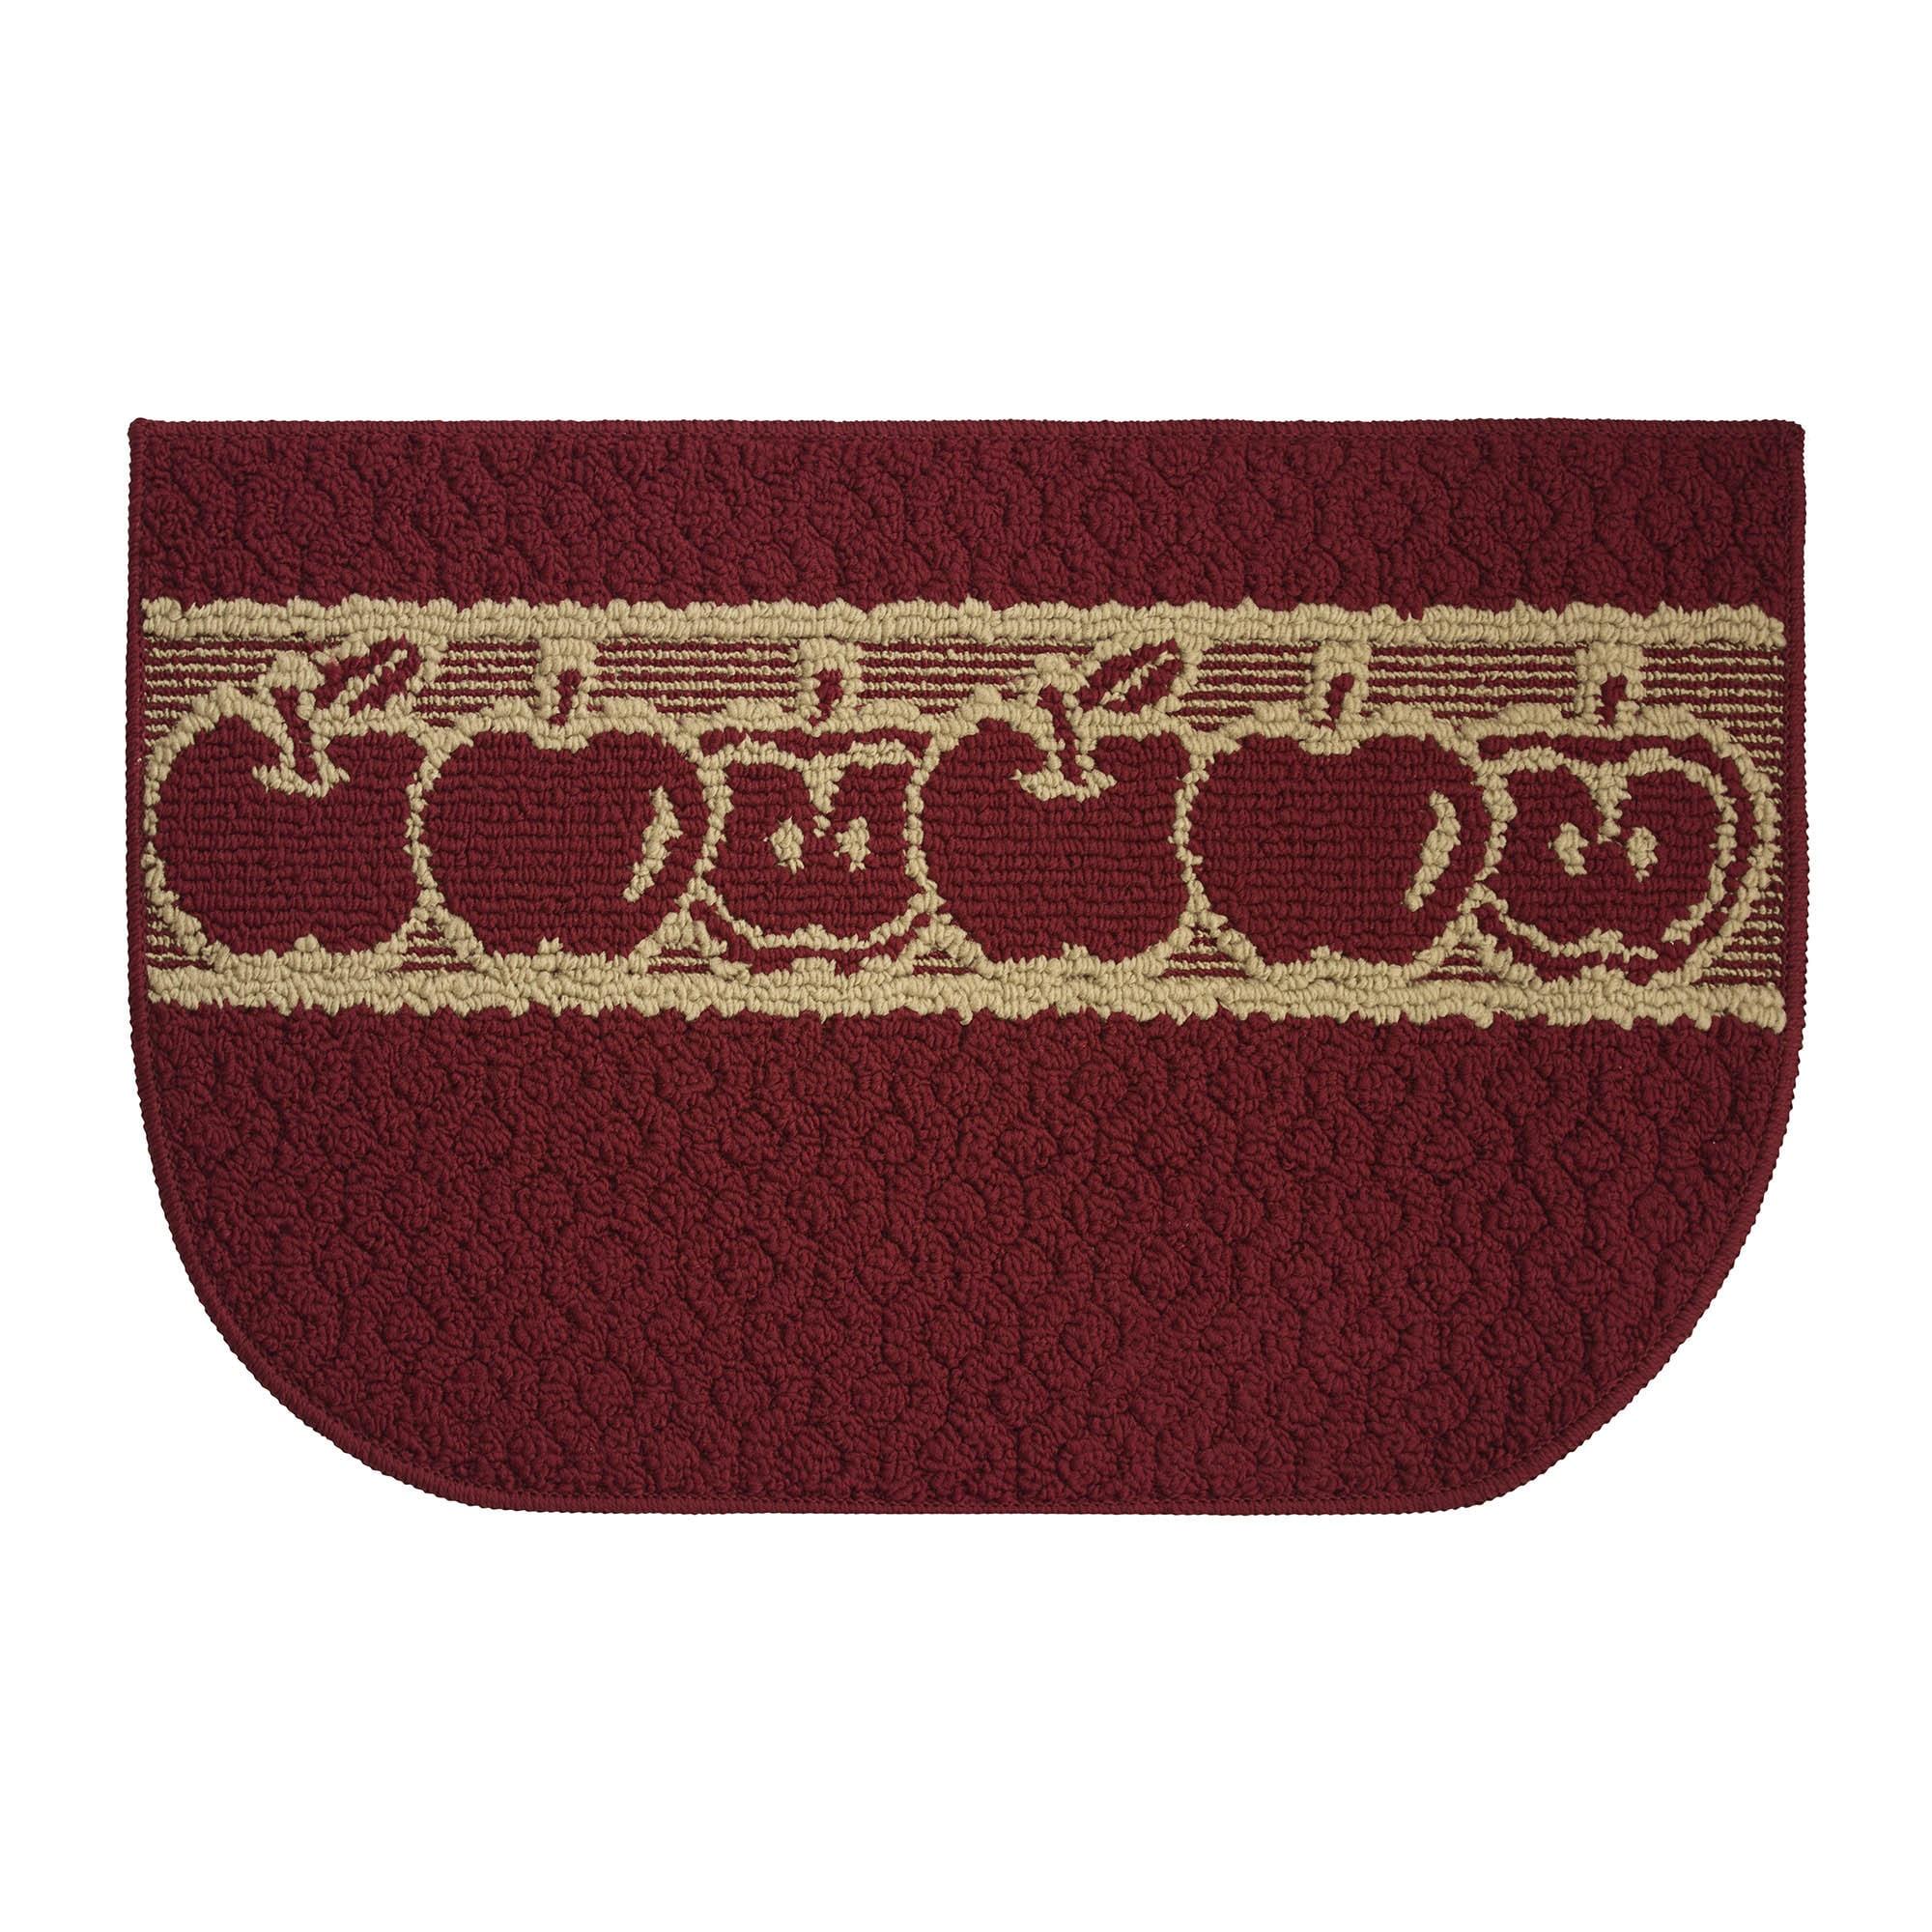 Structures Sunnyside Apples Red Olefin Textured Loop Wedge Kitchen Rug 1 5 X 2 5 Overstock 14275061